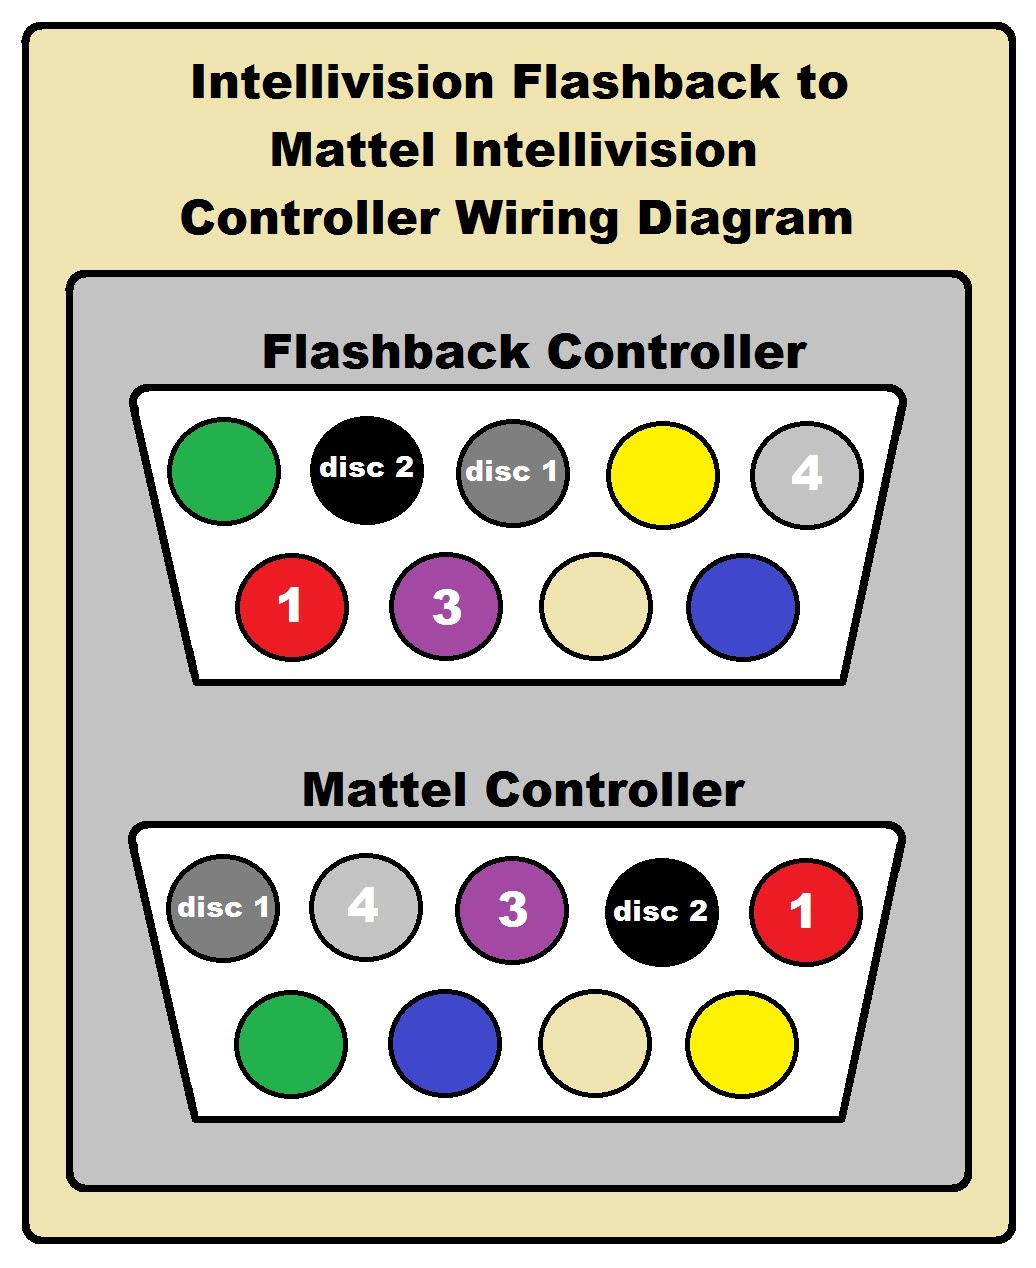 flashback wiring diagram image 3